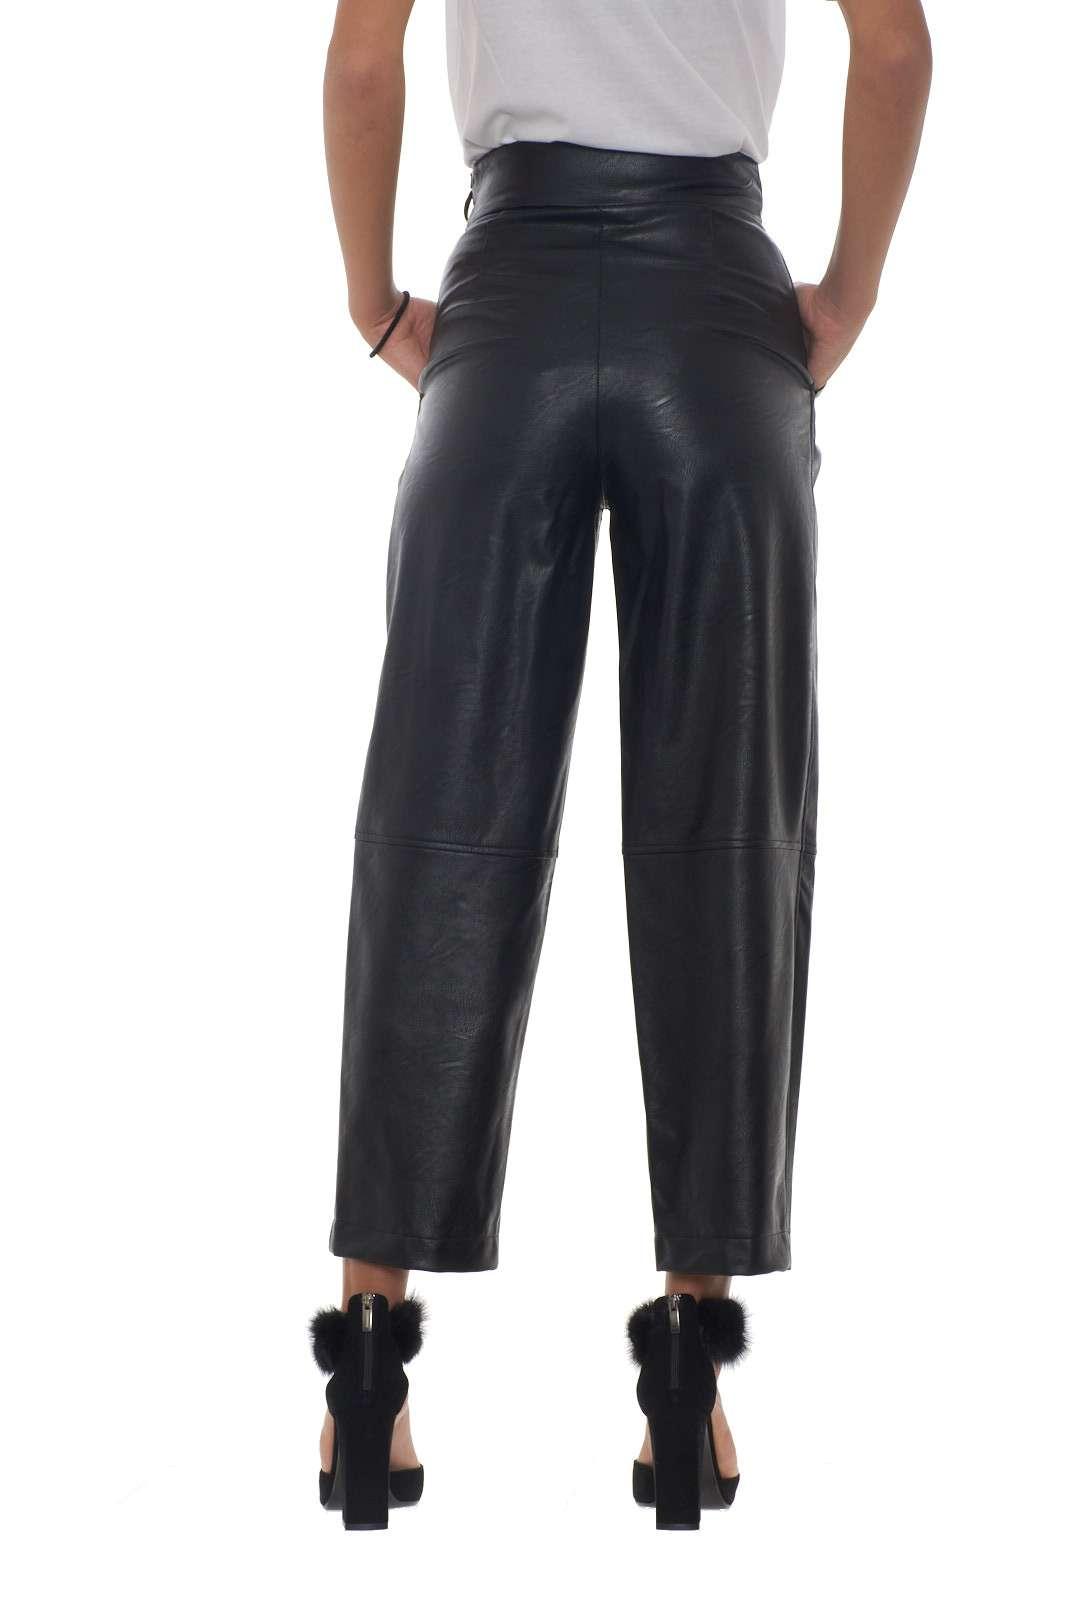 https://www.parmax.com/media/catalog/product/a/i/AI-outlet_parmax-pantaloni-donna-Twin-Set-192TT203C-C.jpg